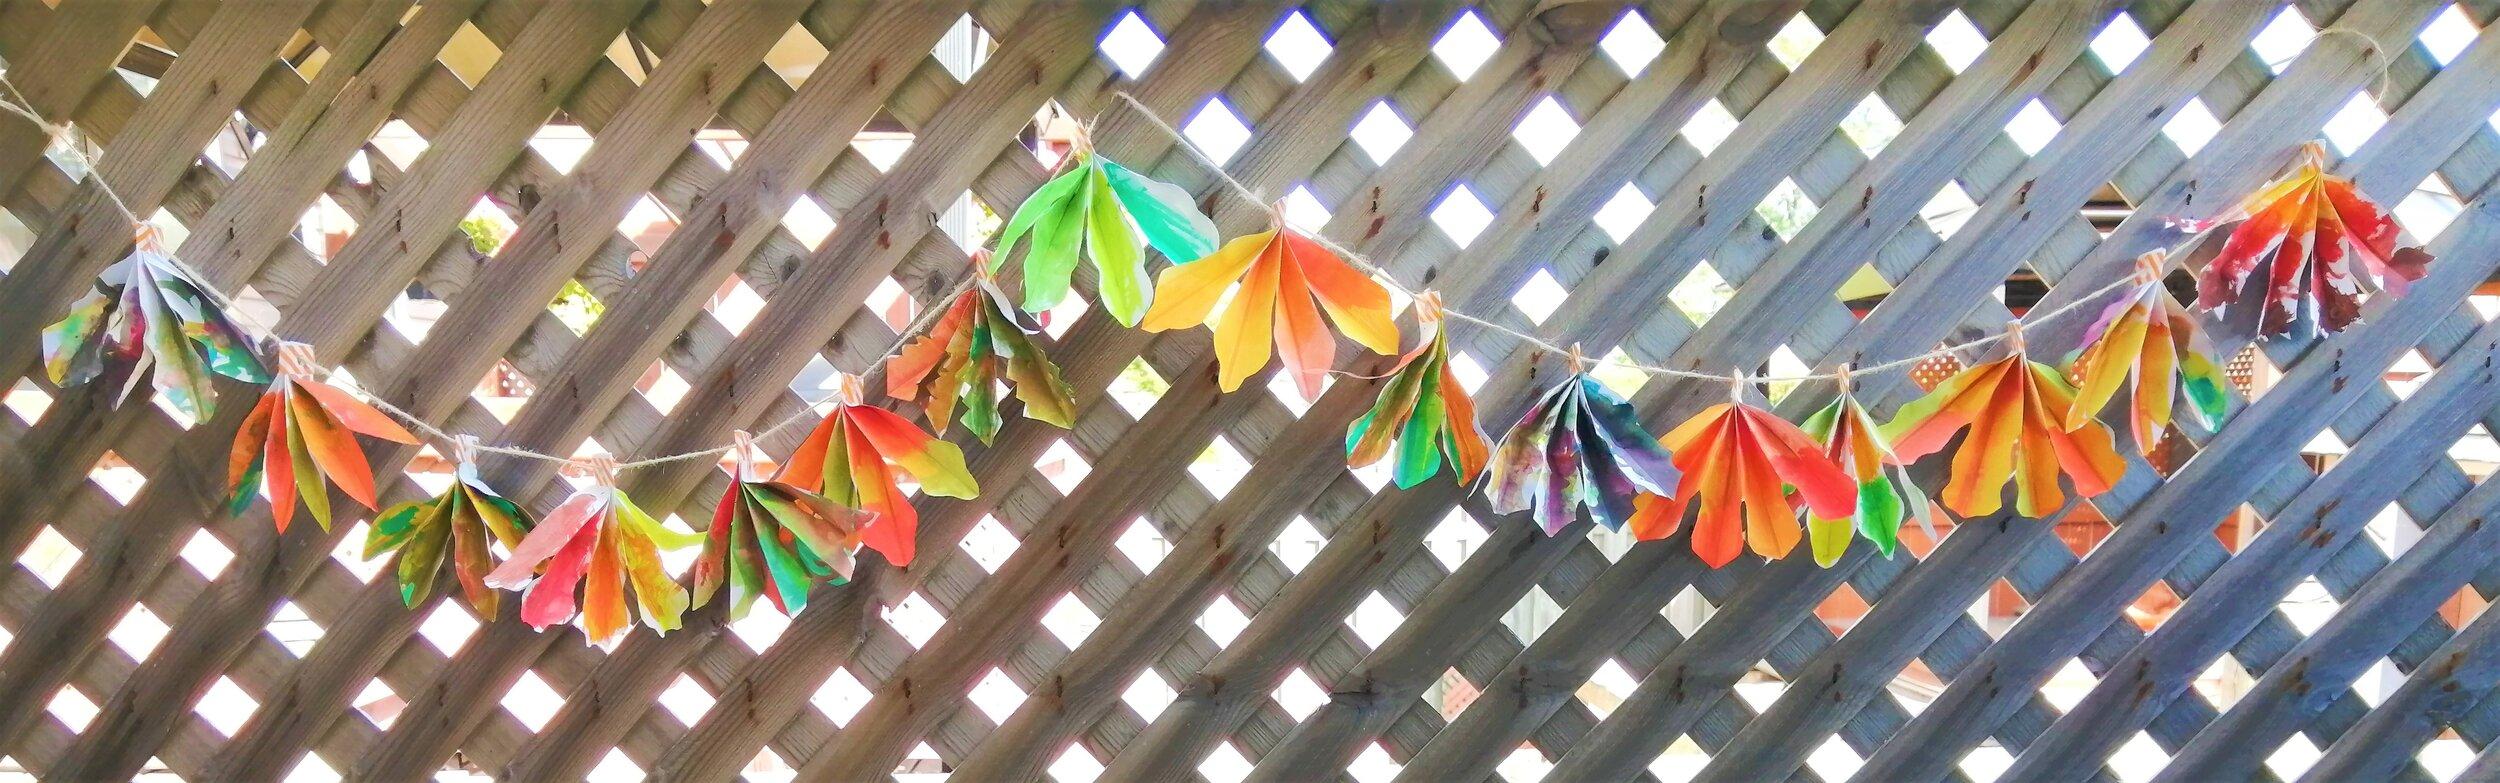 résulta-final-guirlande-automne-feuille-papier-brico